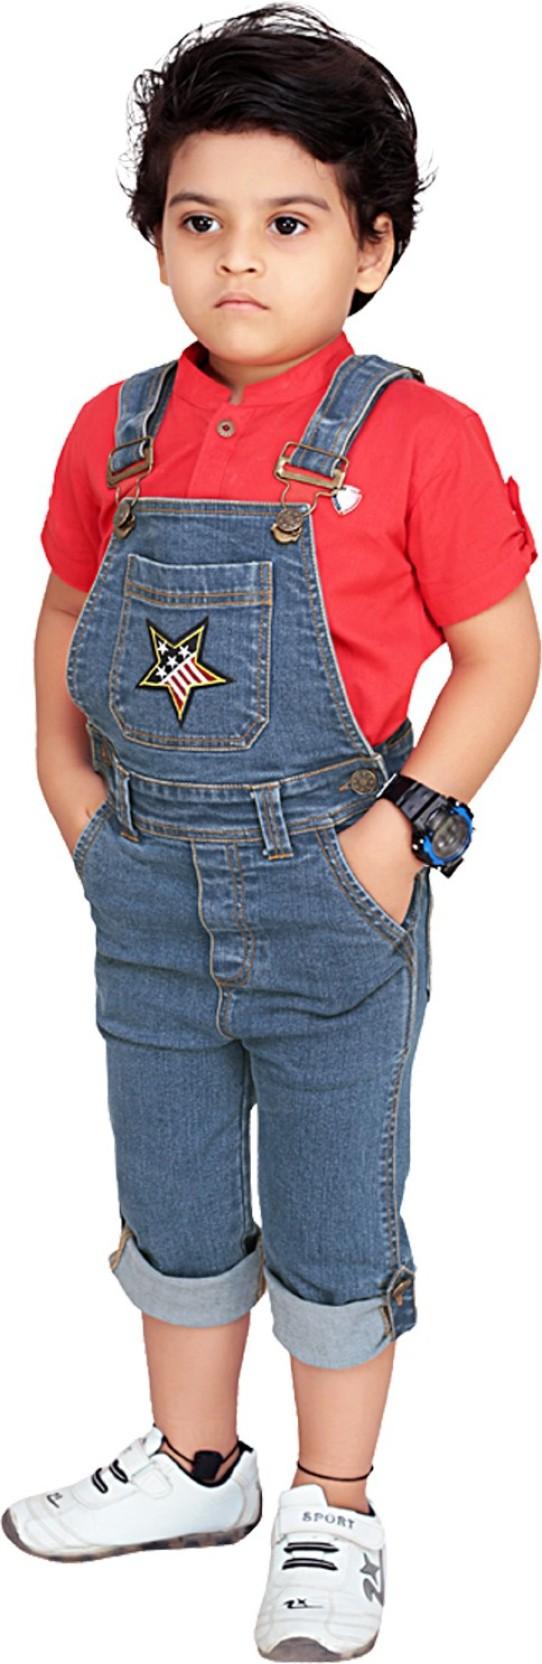 29240aaa616 Olele Dungaree For Boys Solid Denim Price in India - Buy Olele ...